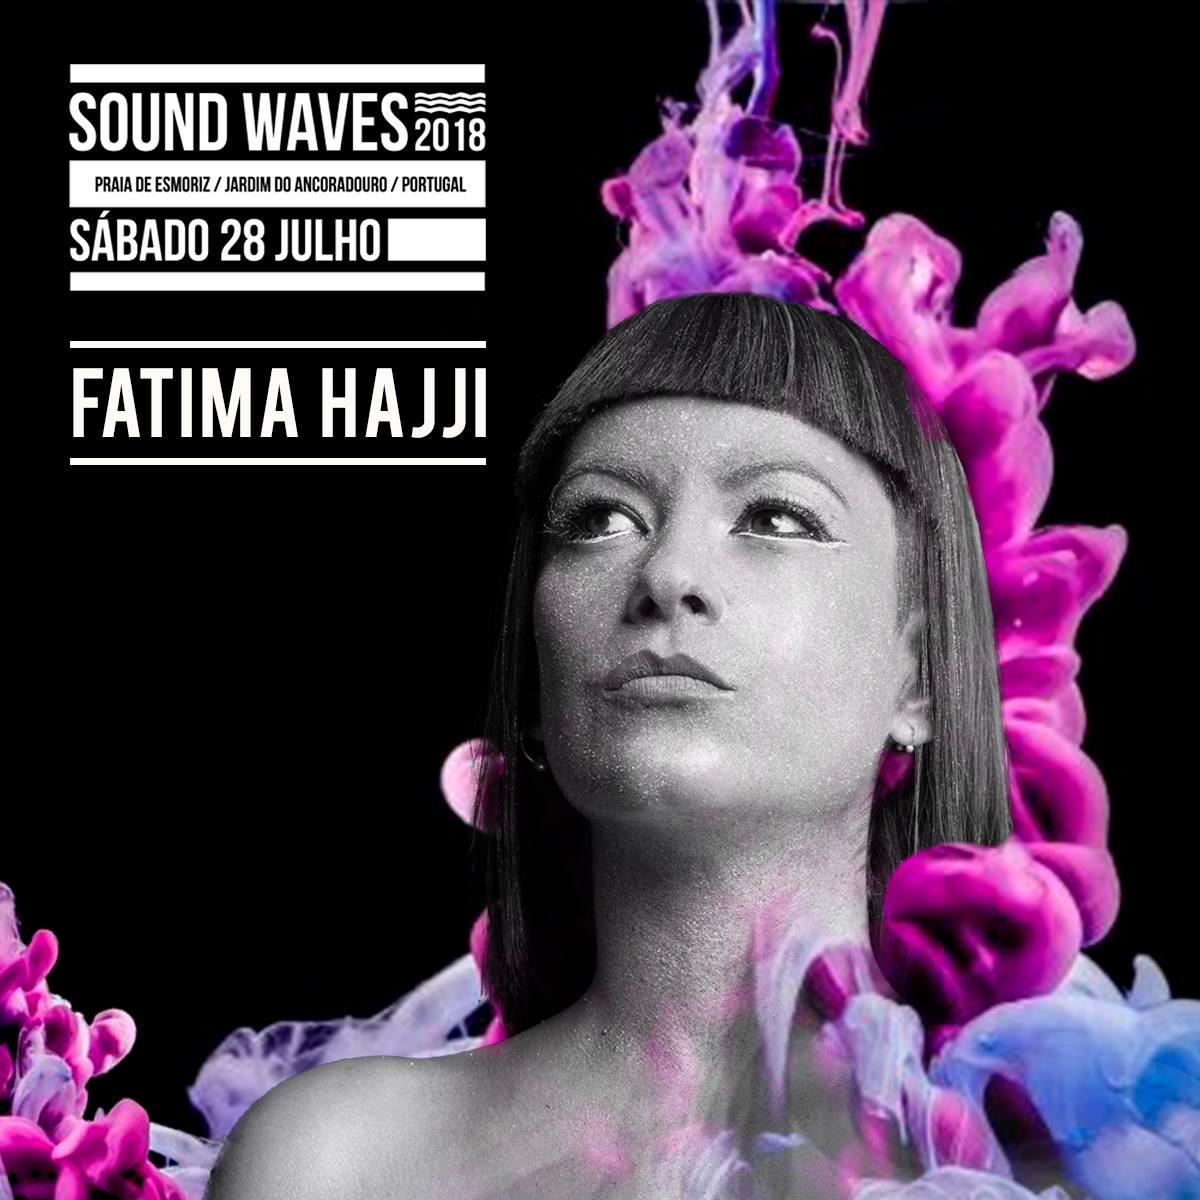 Fatima Hajji SW 2018